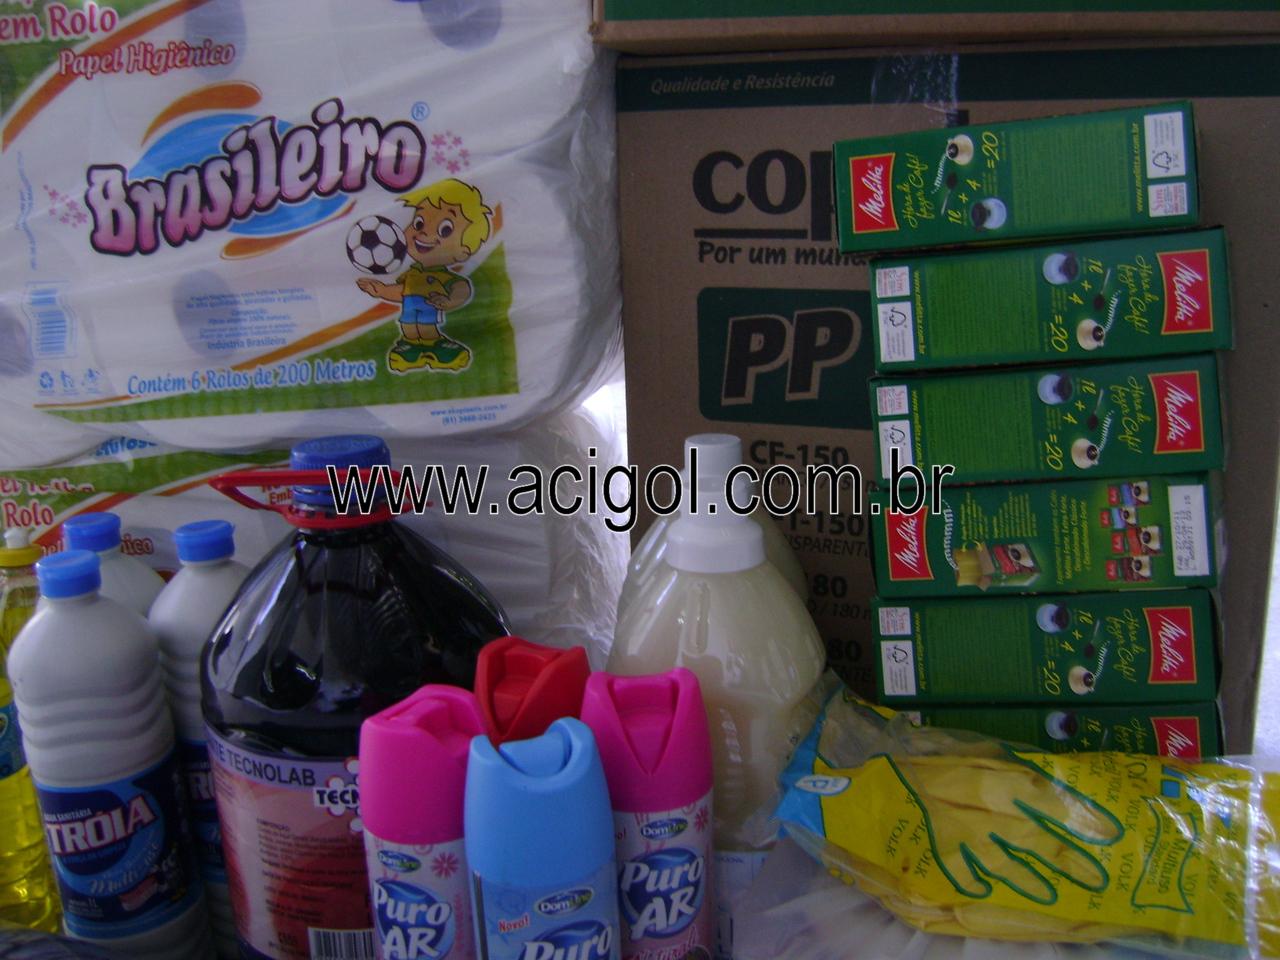 Foto Acigol Recife-81 34451782-DSC09749